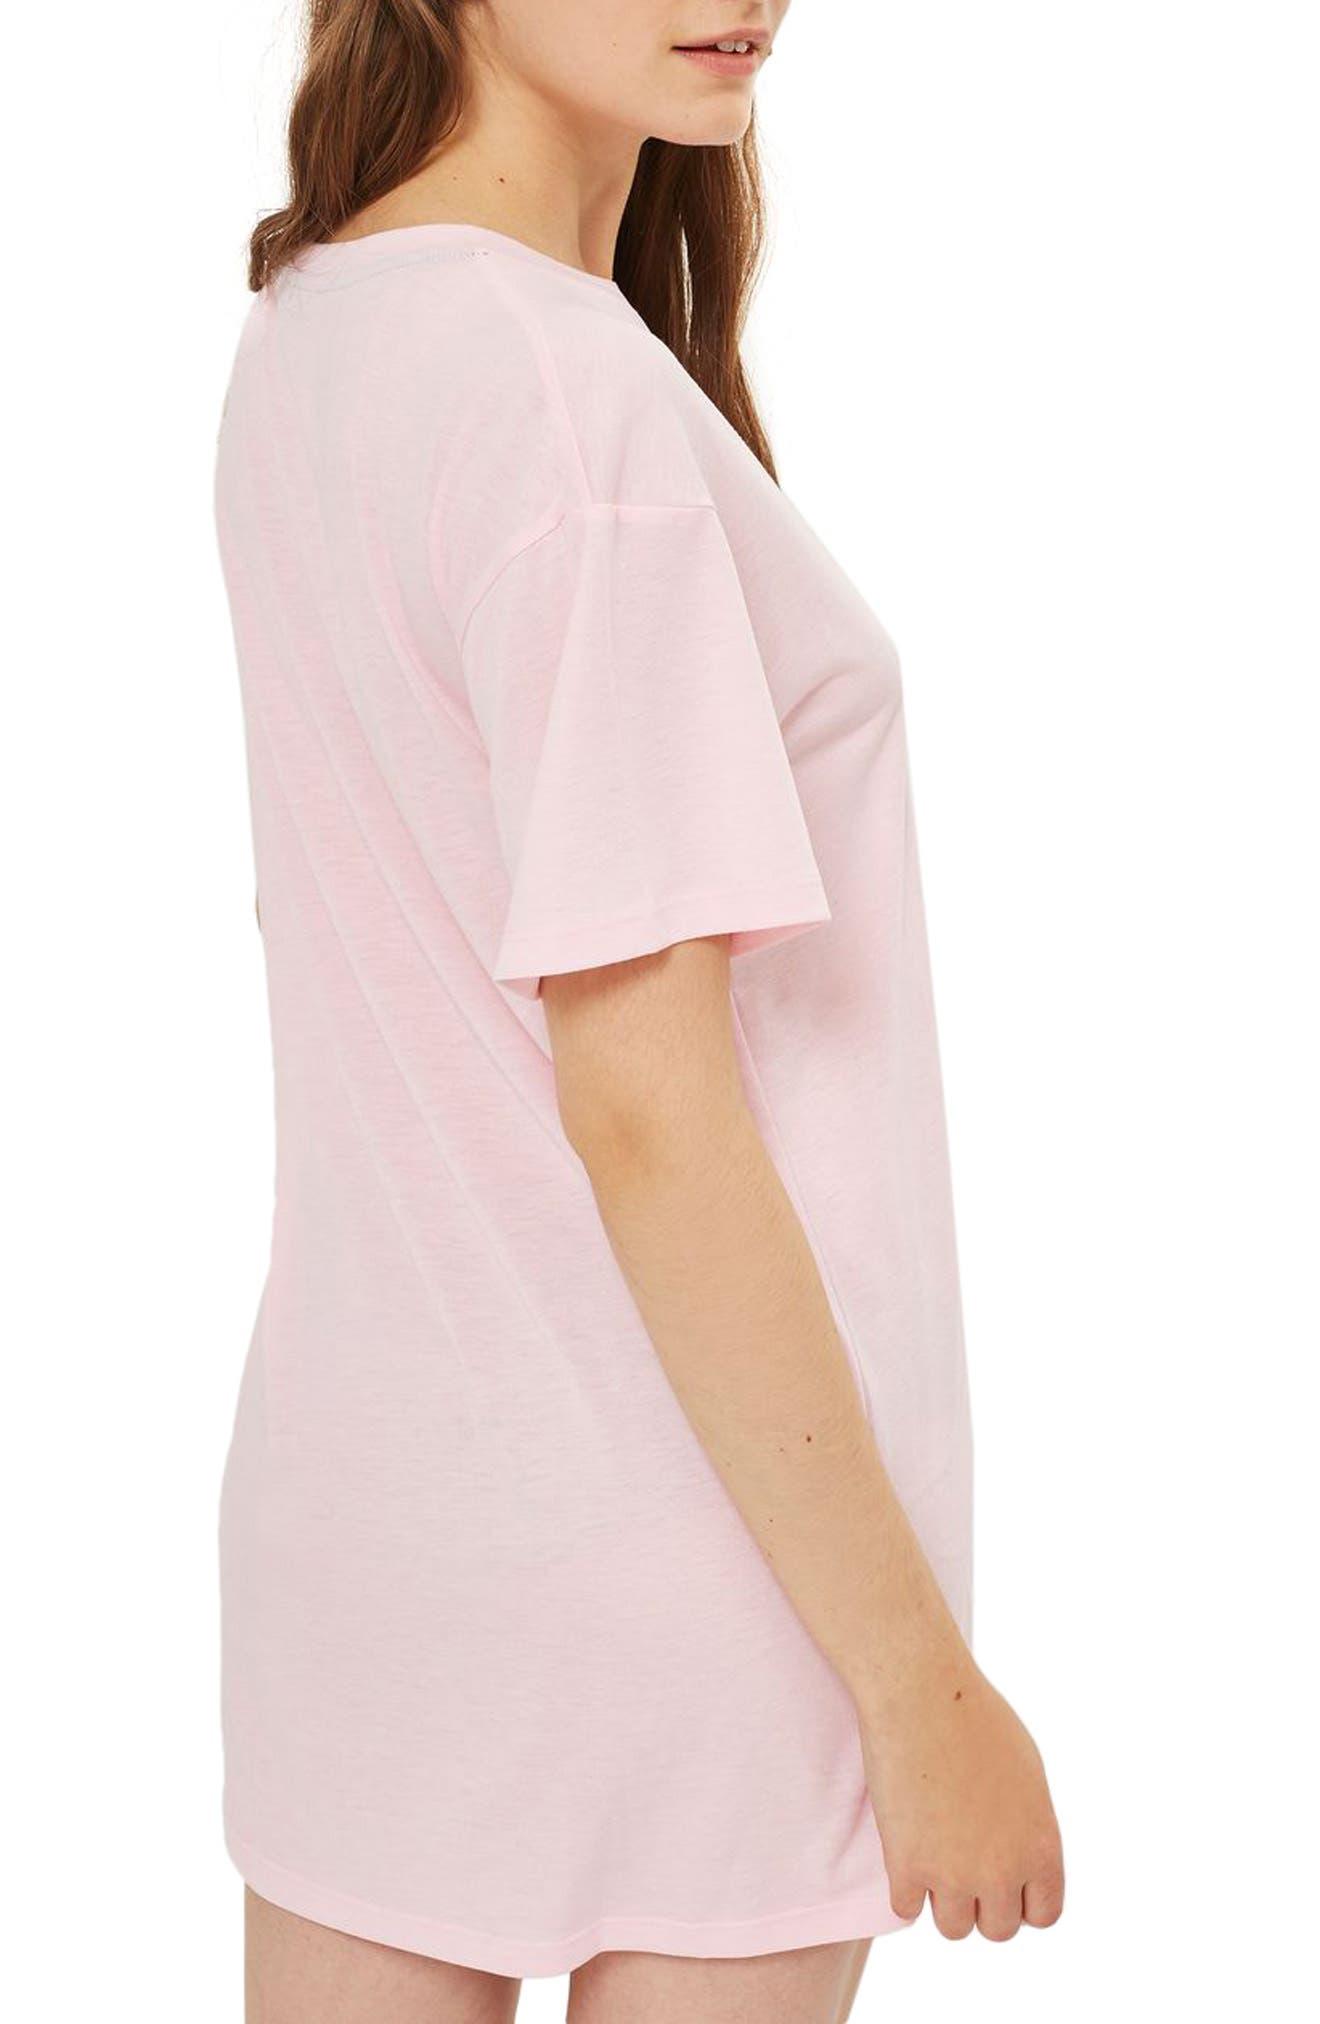 Dreamer Embroidered Sleep Shirt,                             Alternate thumbnail 2, color,                             Pink